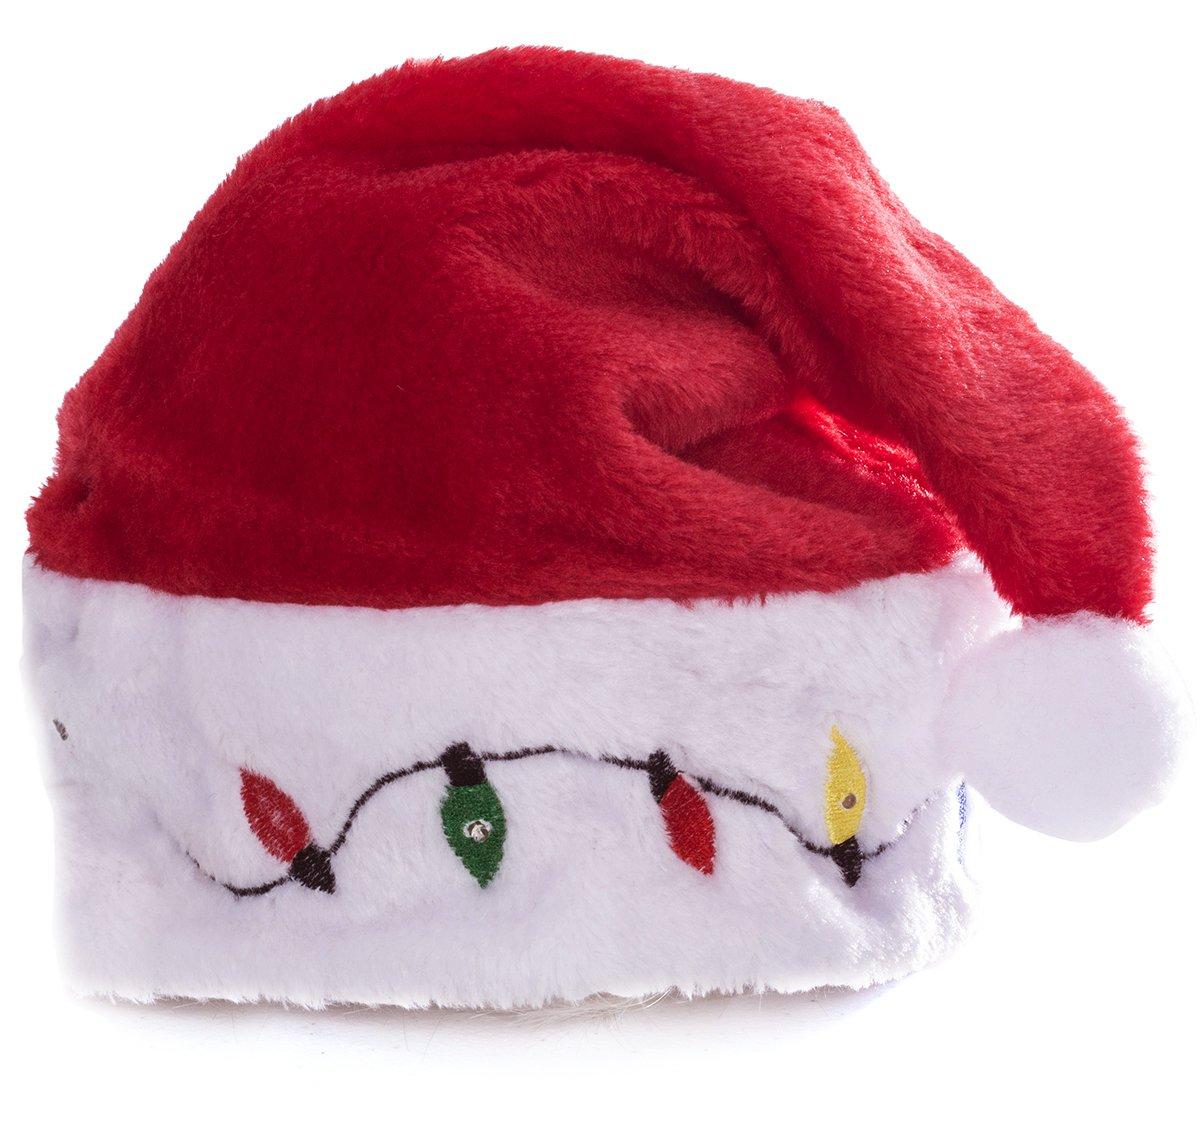 517dece423074 Funny Party Hats Santa Hats - Christmas Novelty Light Up Hats ...